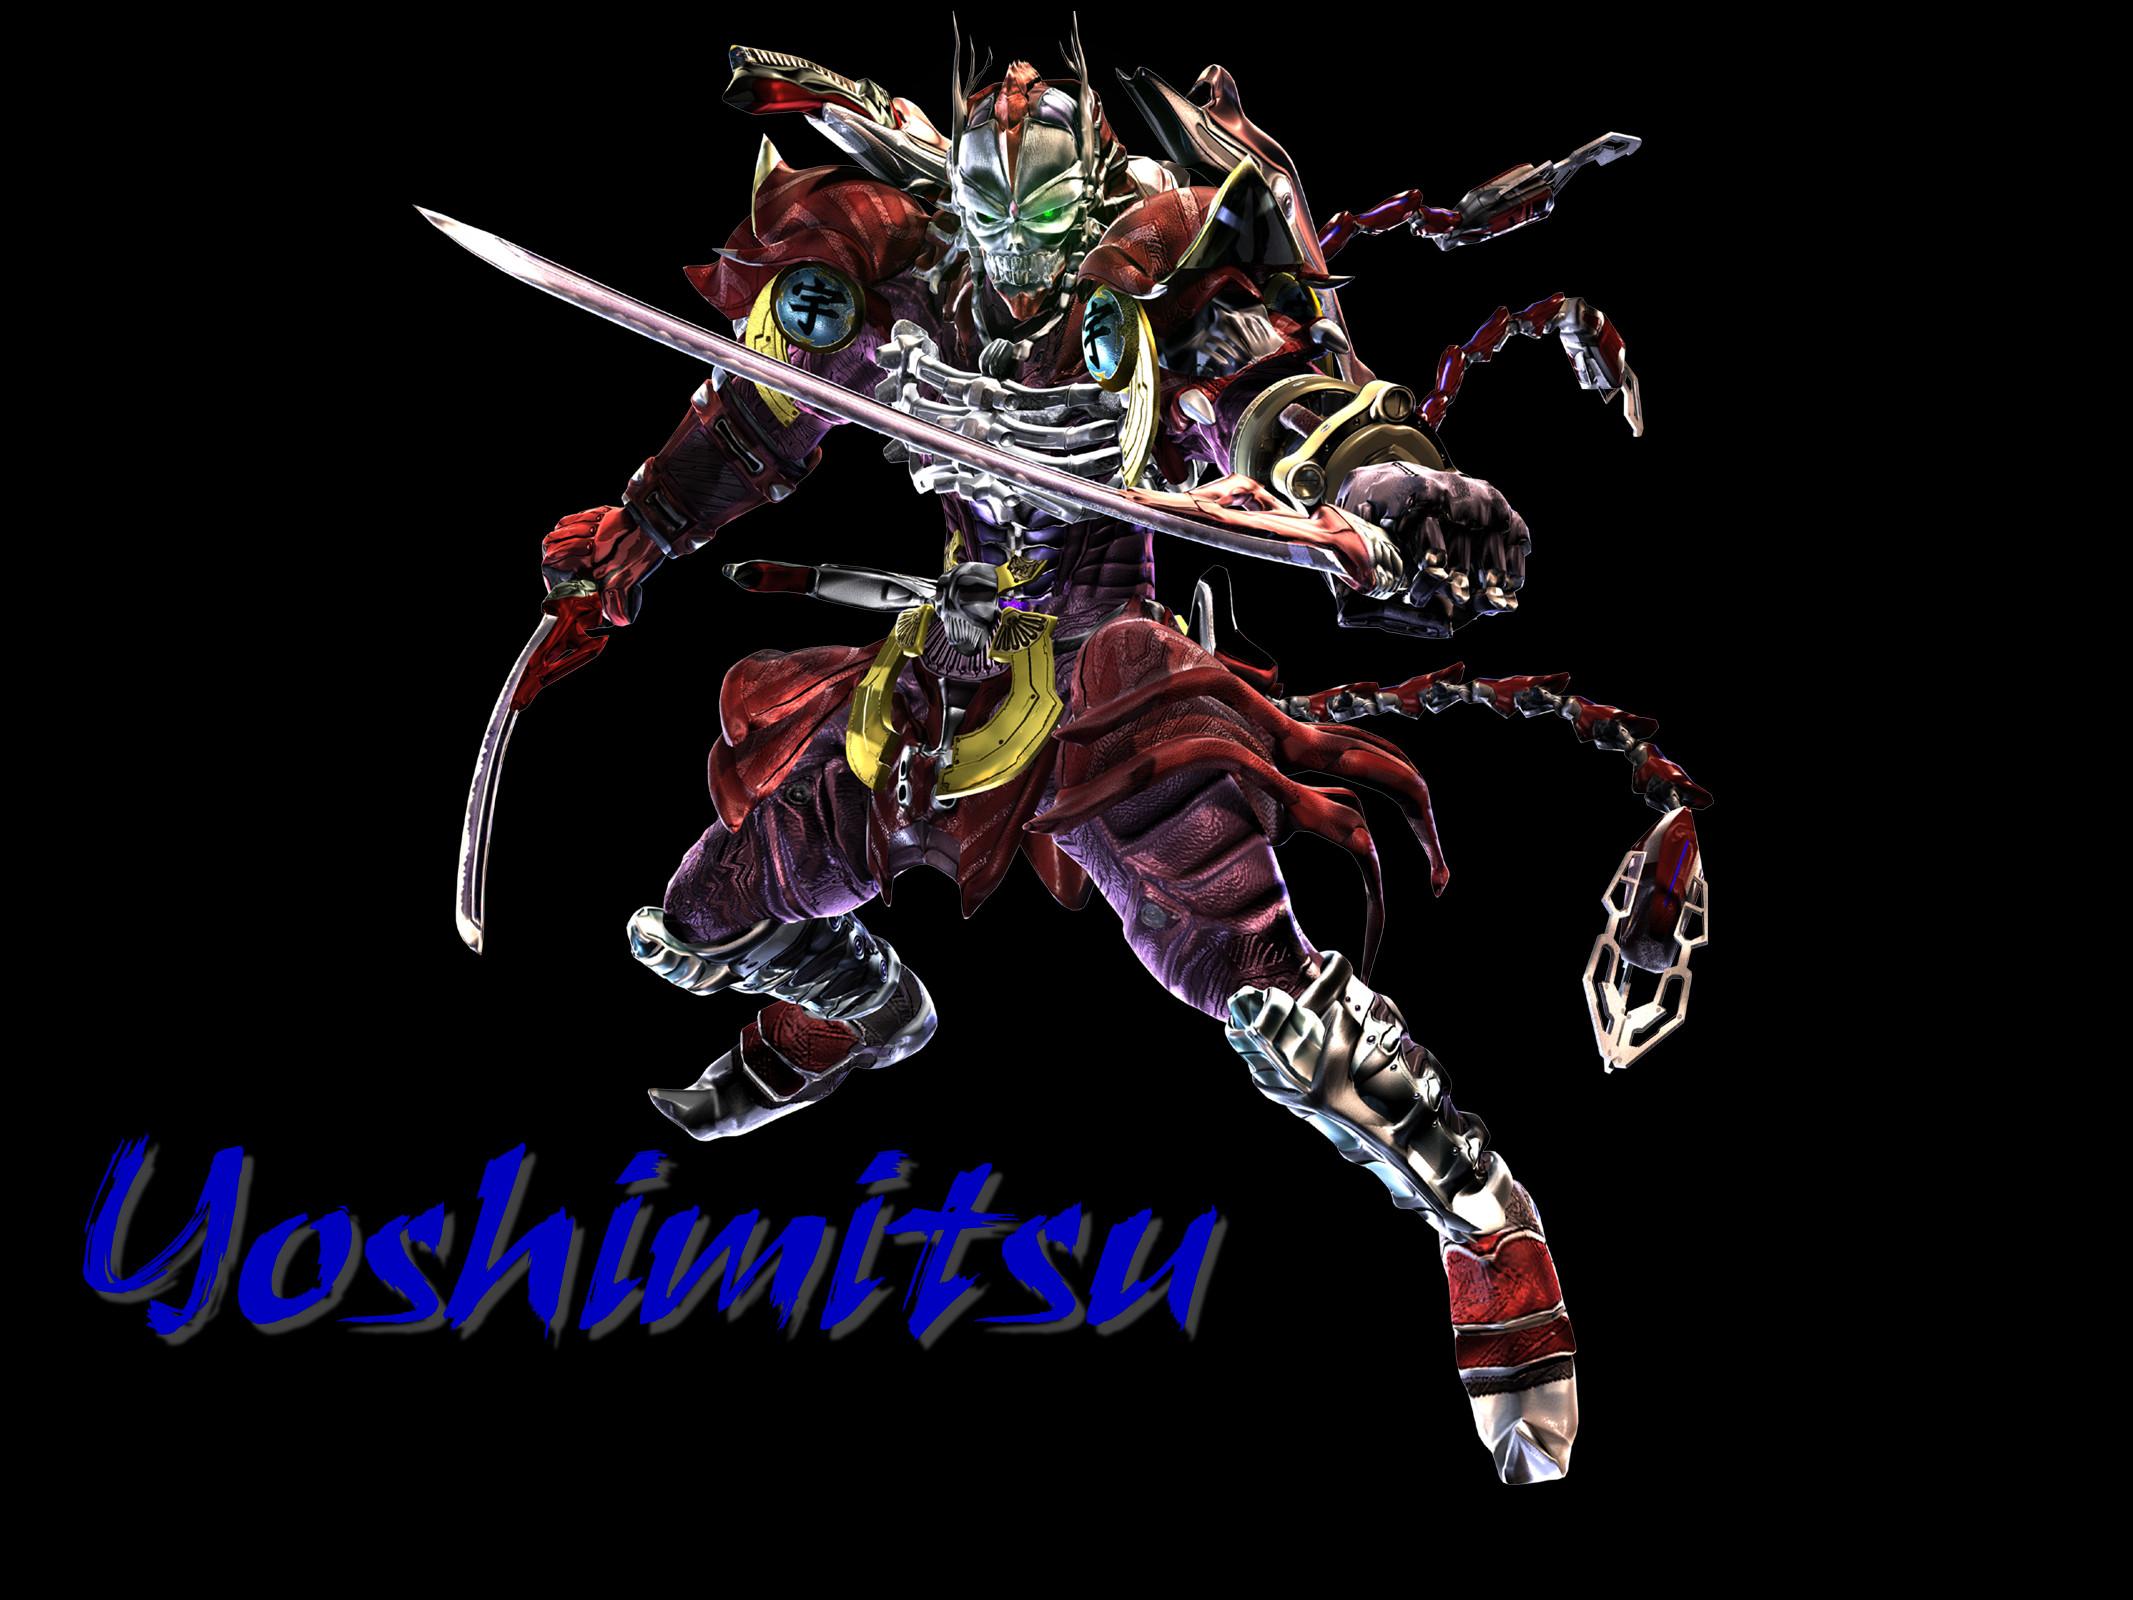 Yoshimitsu Wallpaper By Sickkness On Deviantart